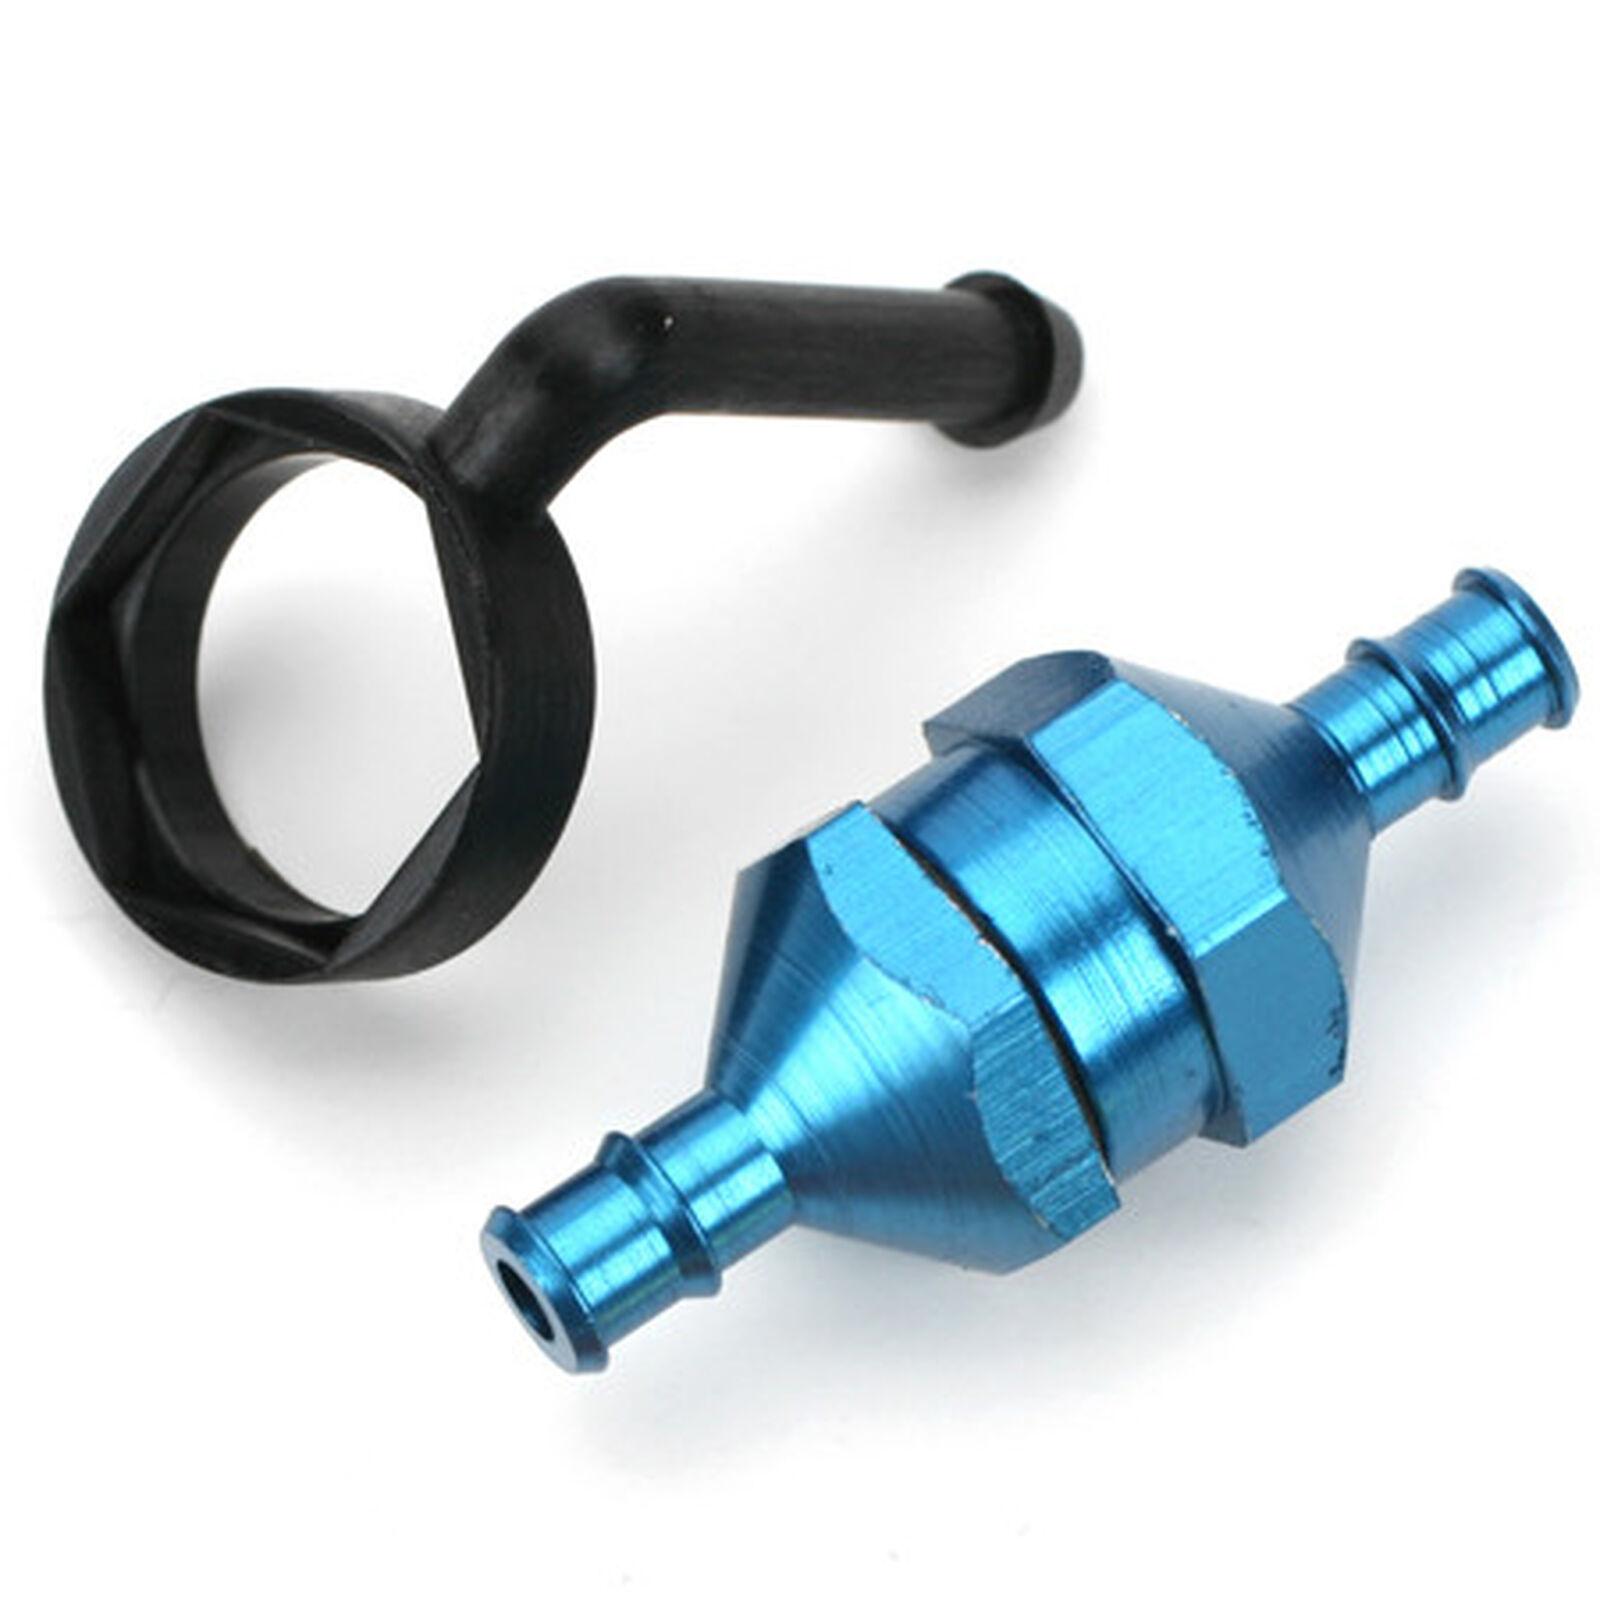 In-Line Fuel Filter, Blue